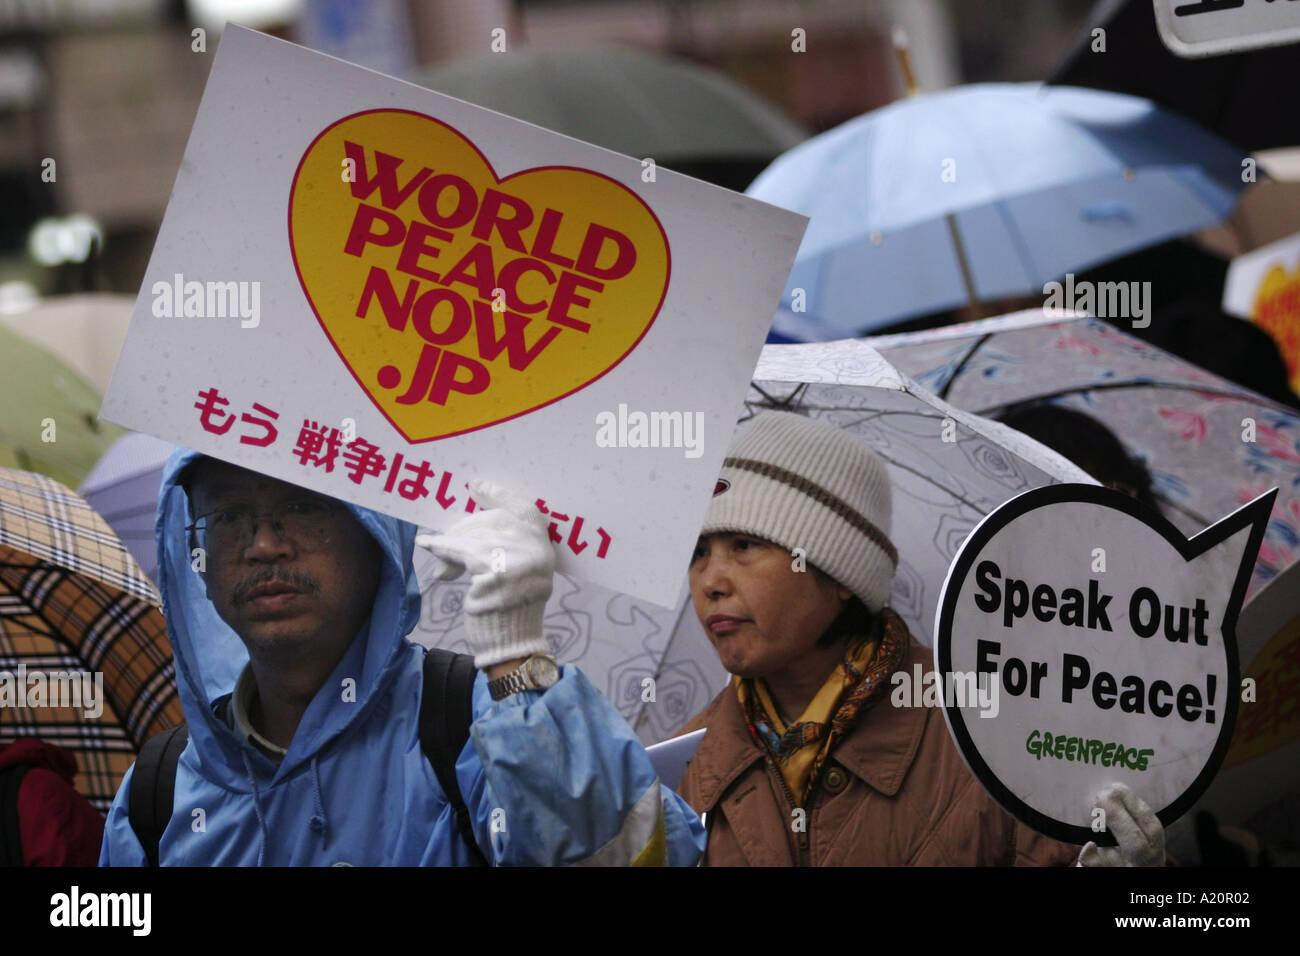 Peace demonstration, Anti-war demo, Japan - Stock Image